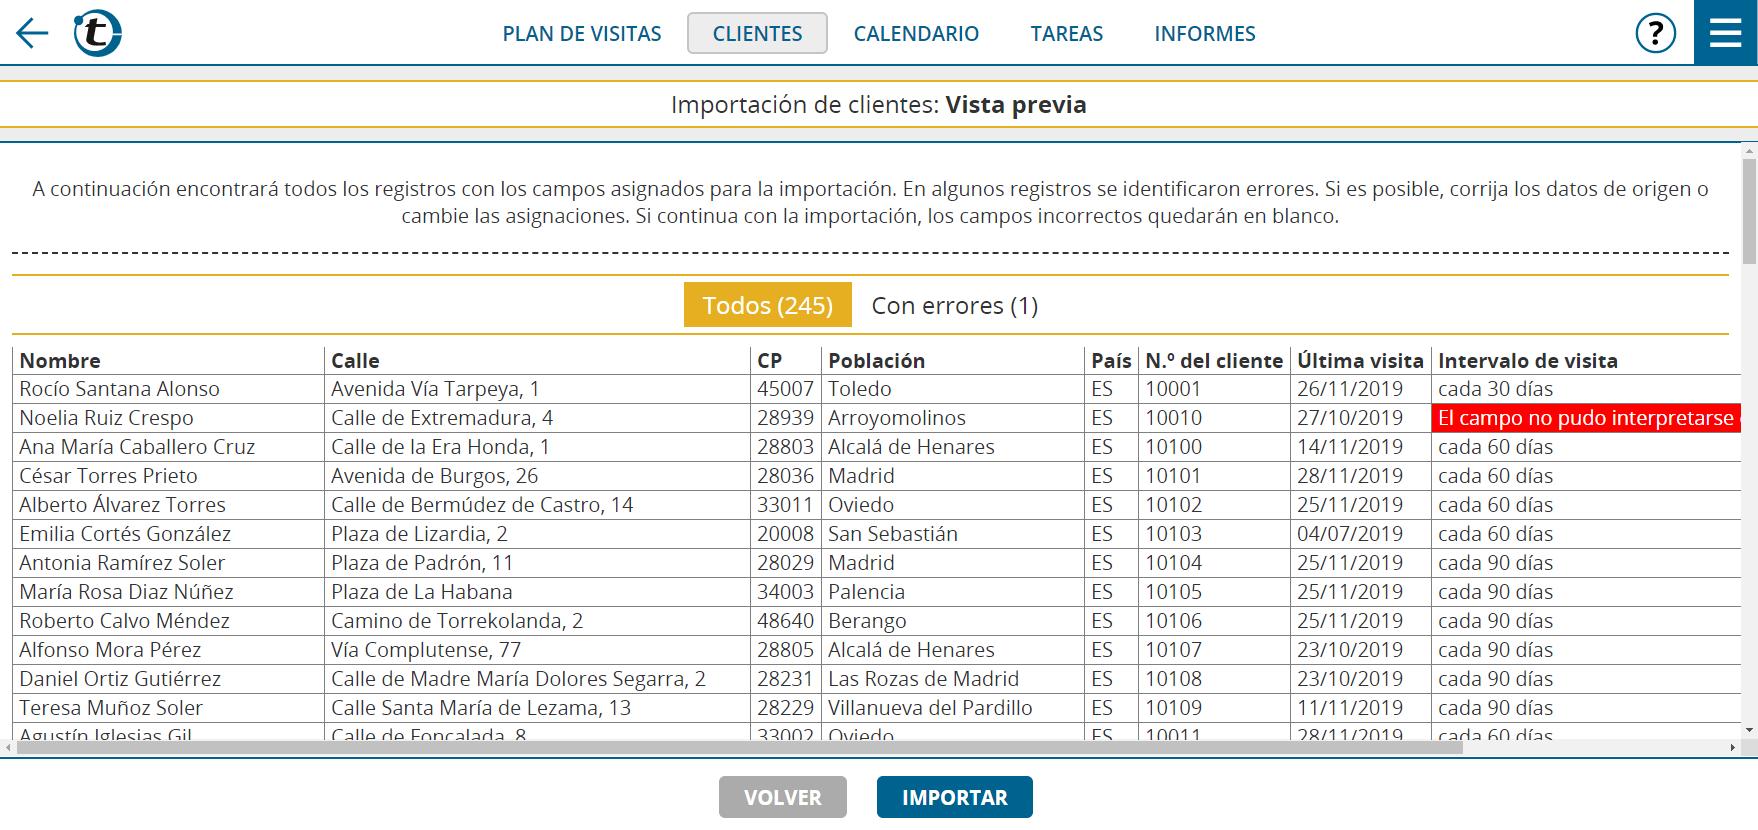 customerimport-preview-es.png